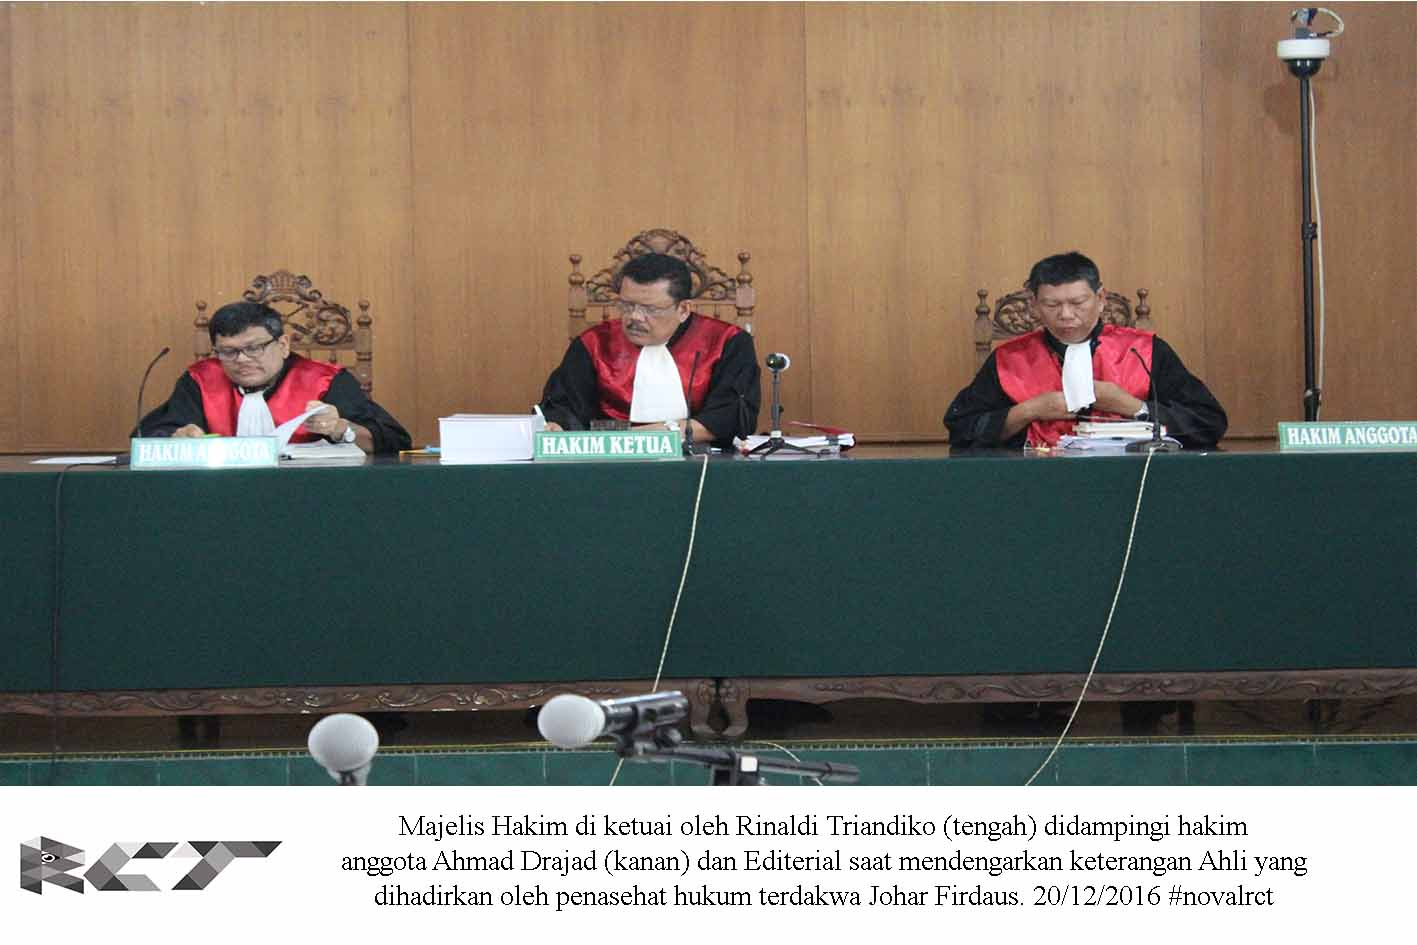 majelis hakim sidang johar suparman 20 des 16